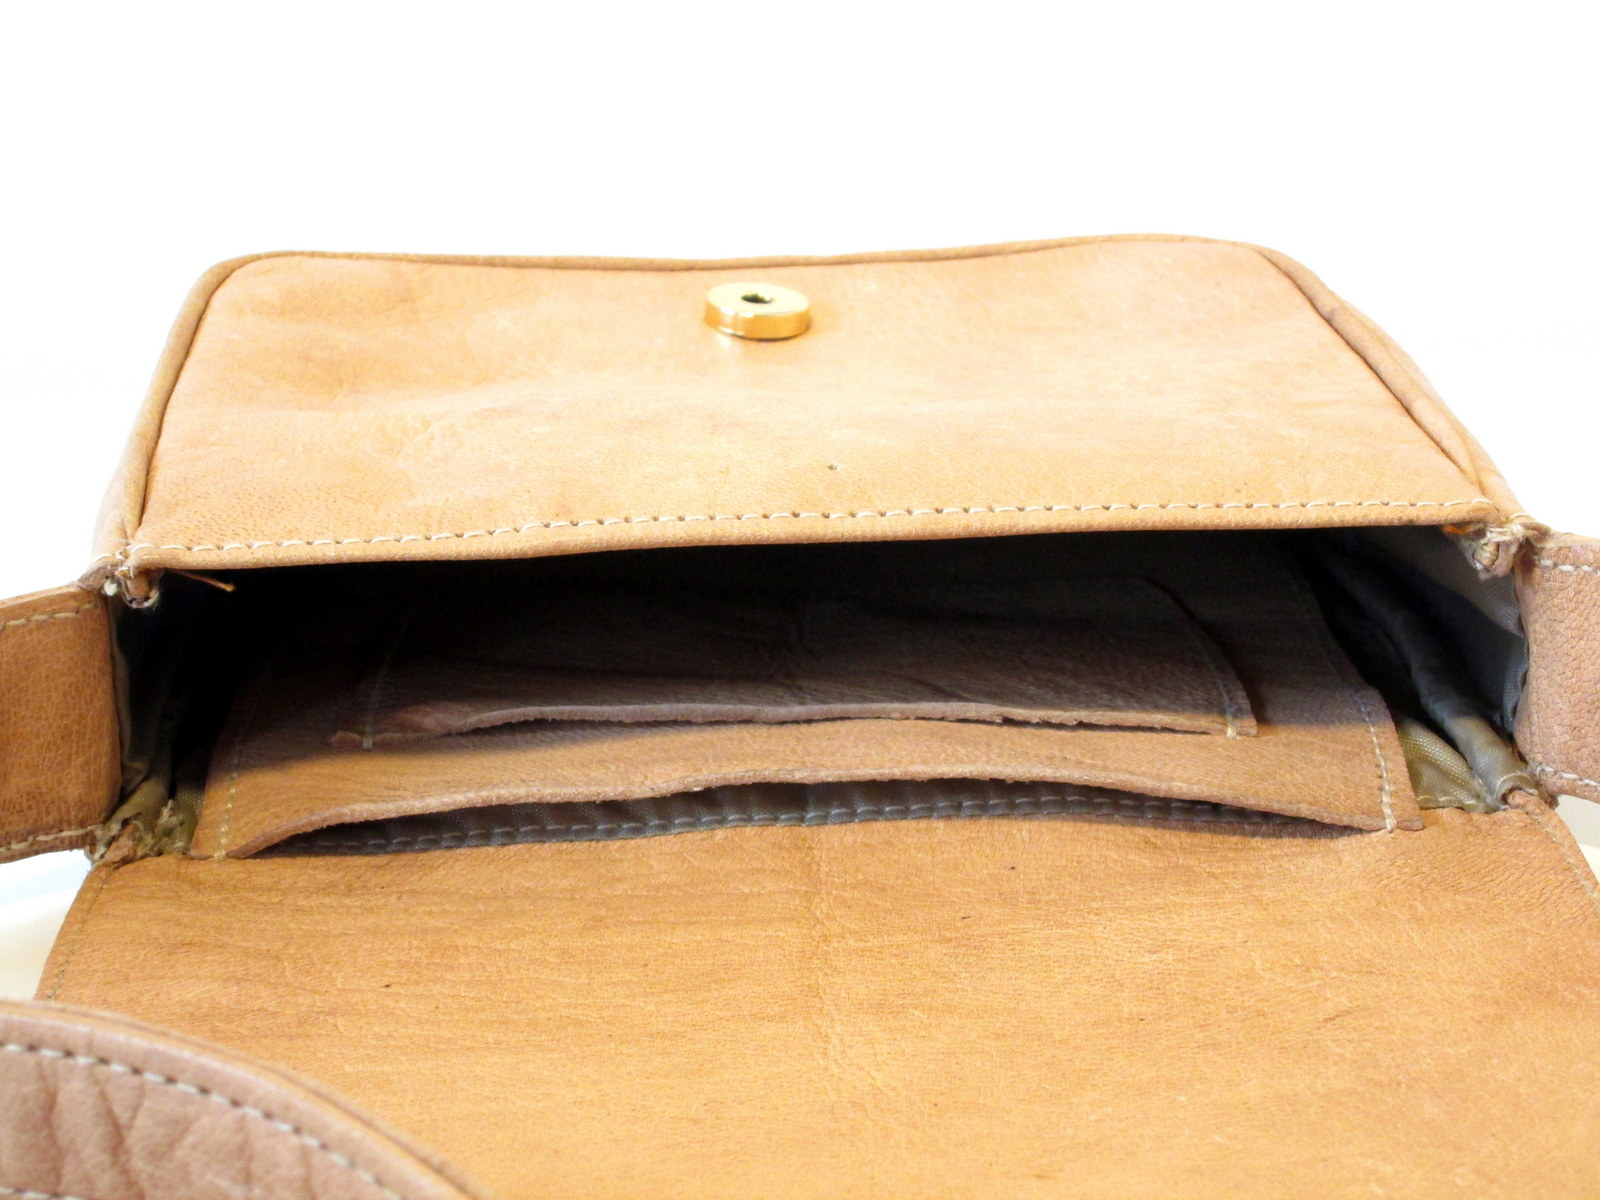 leather bag withlining and inside pockets - Gundara